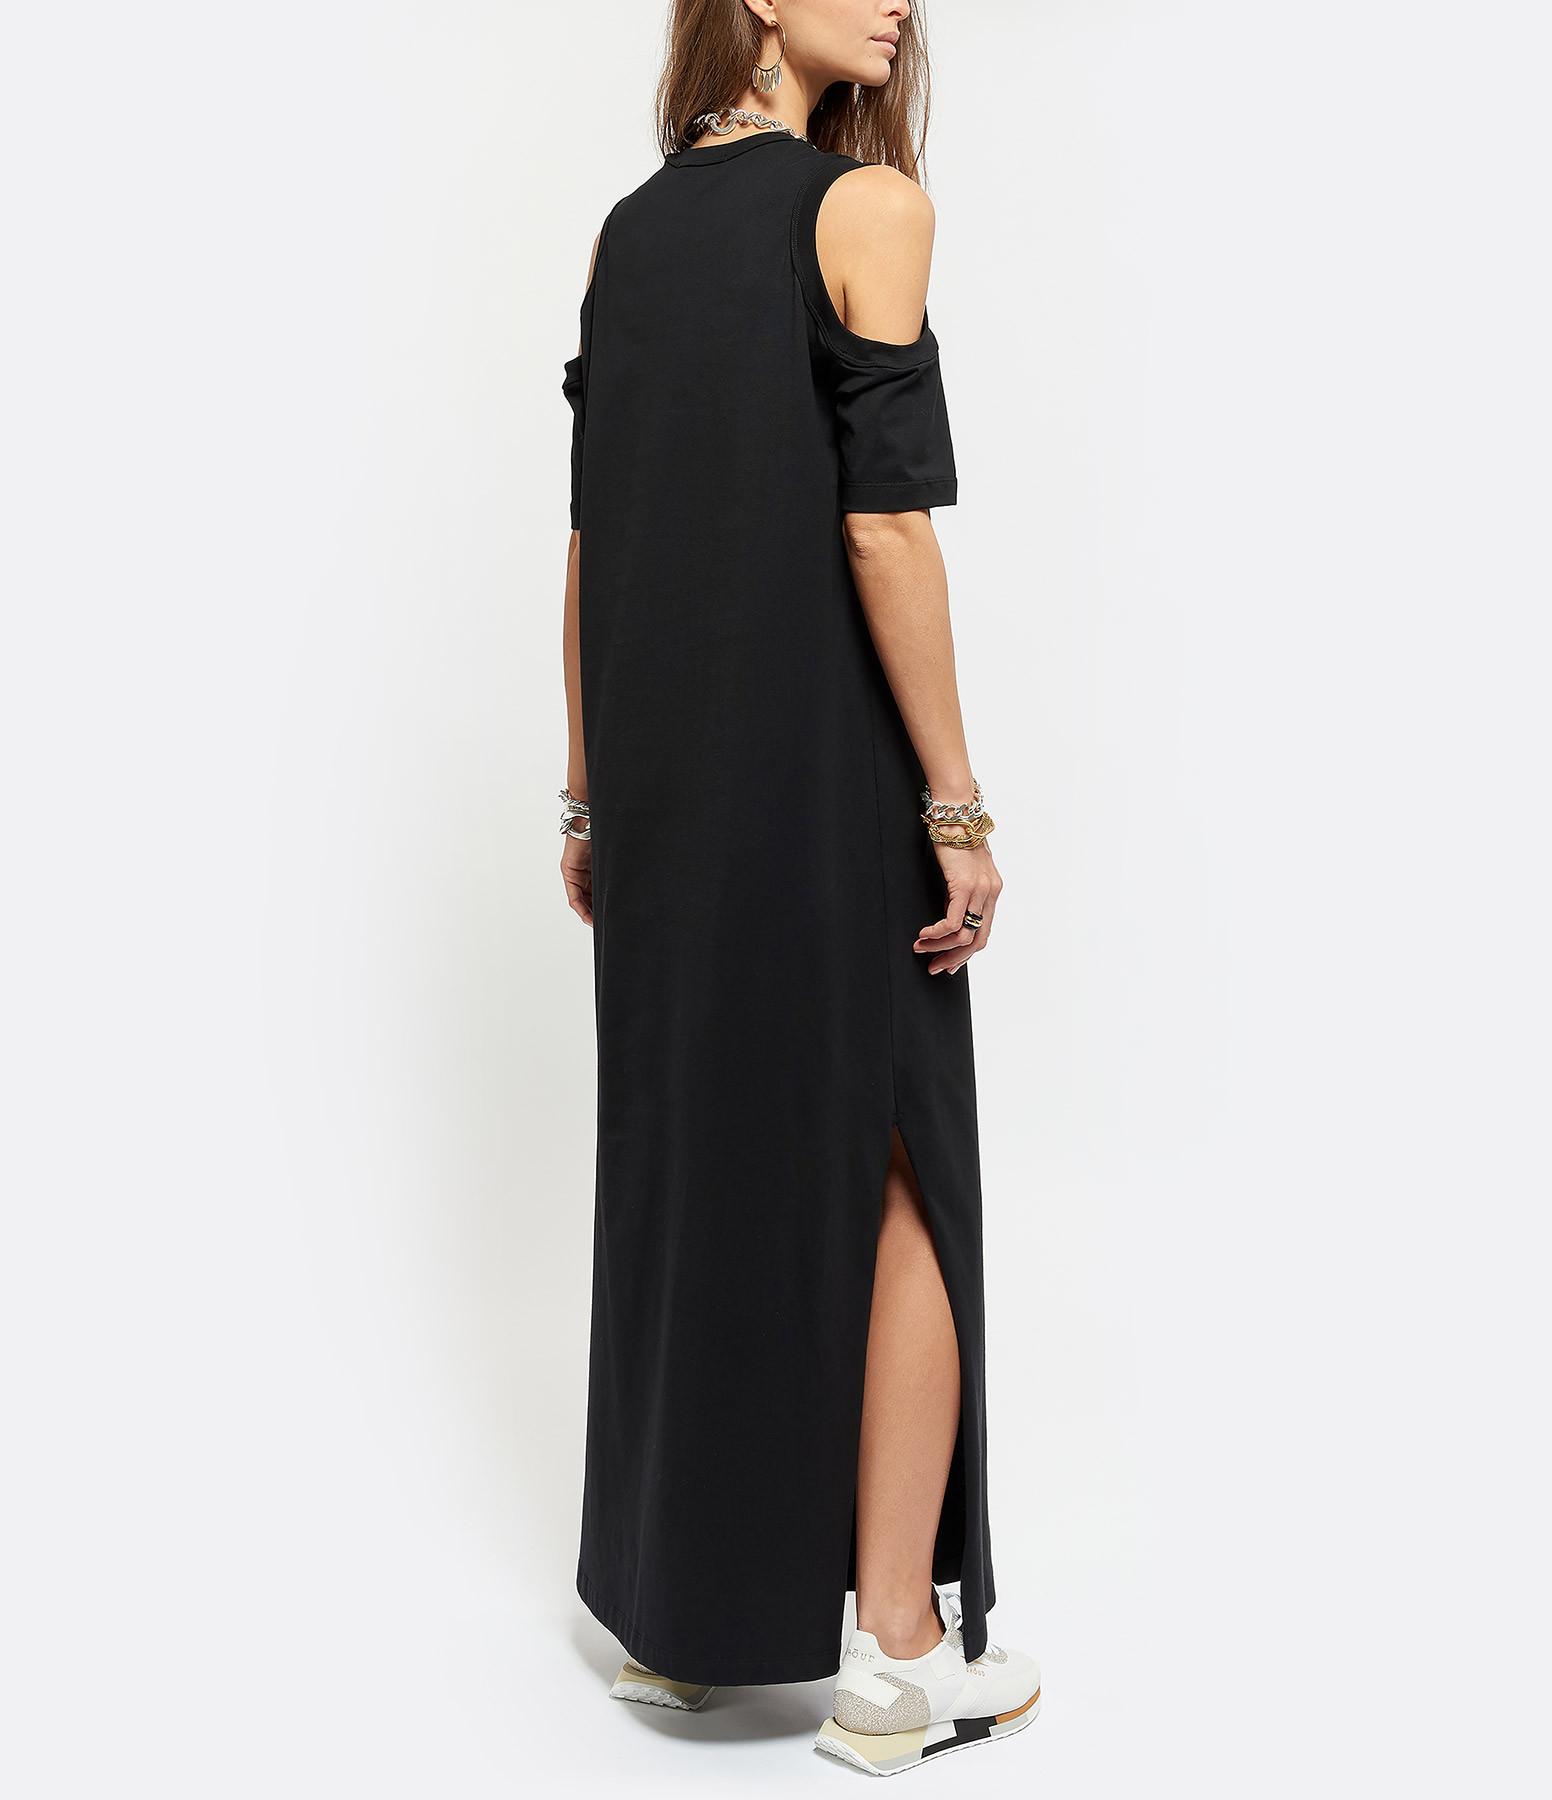 MSGM - Robe Longue Noir